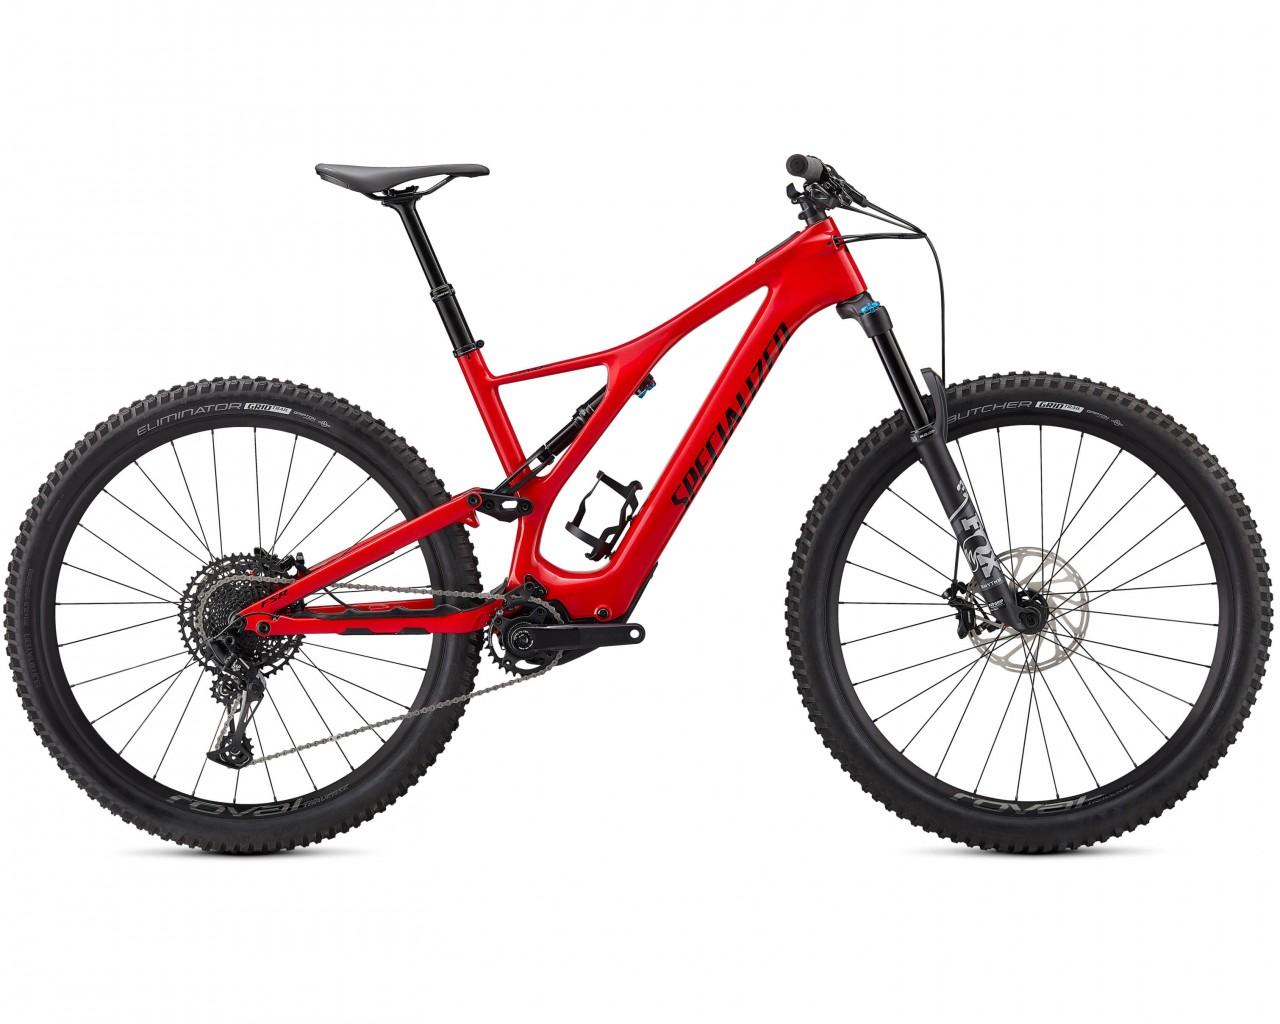 Specialized Levo SL Comp Carbon 29 - Elektro Carbon MTB Fully 2021 | flo red-black